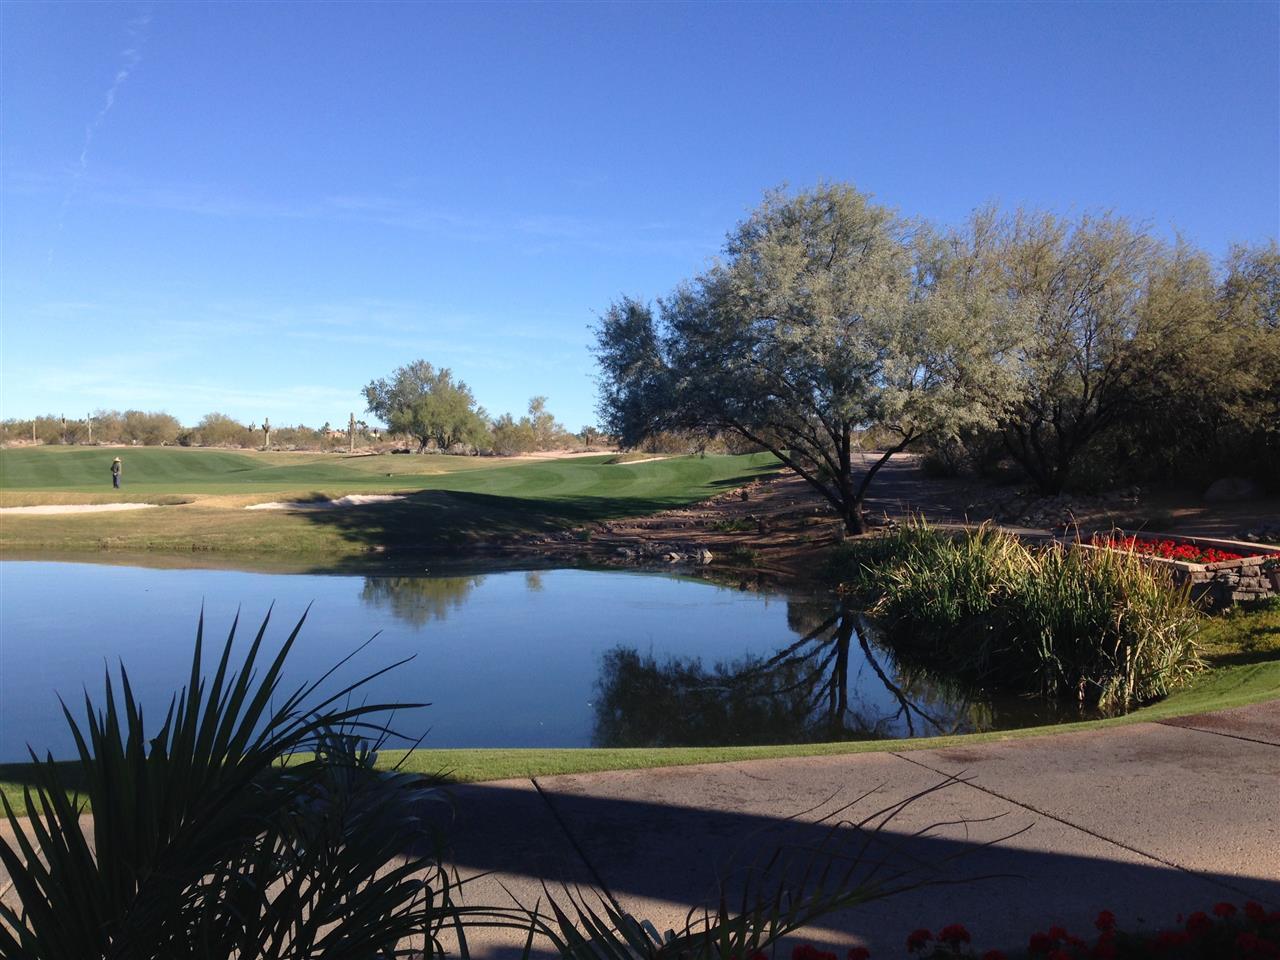 An incredibly beautiful public golf course #Grayhawk#Scottsdale#Arizona